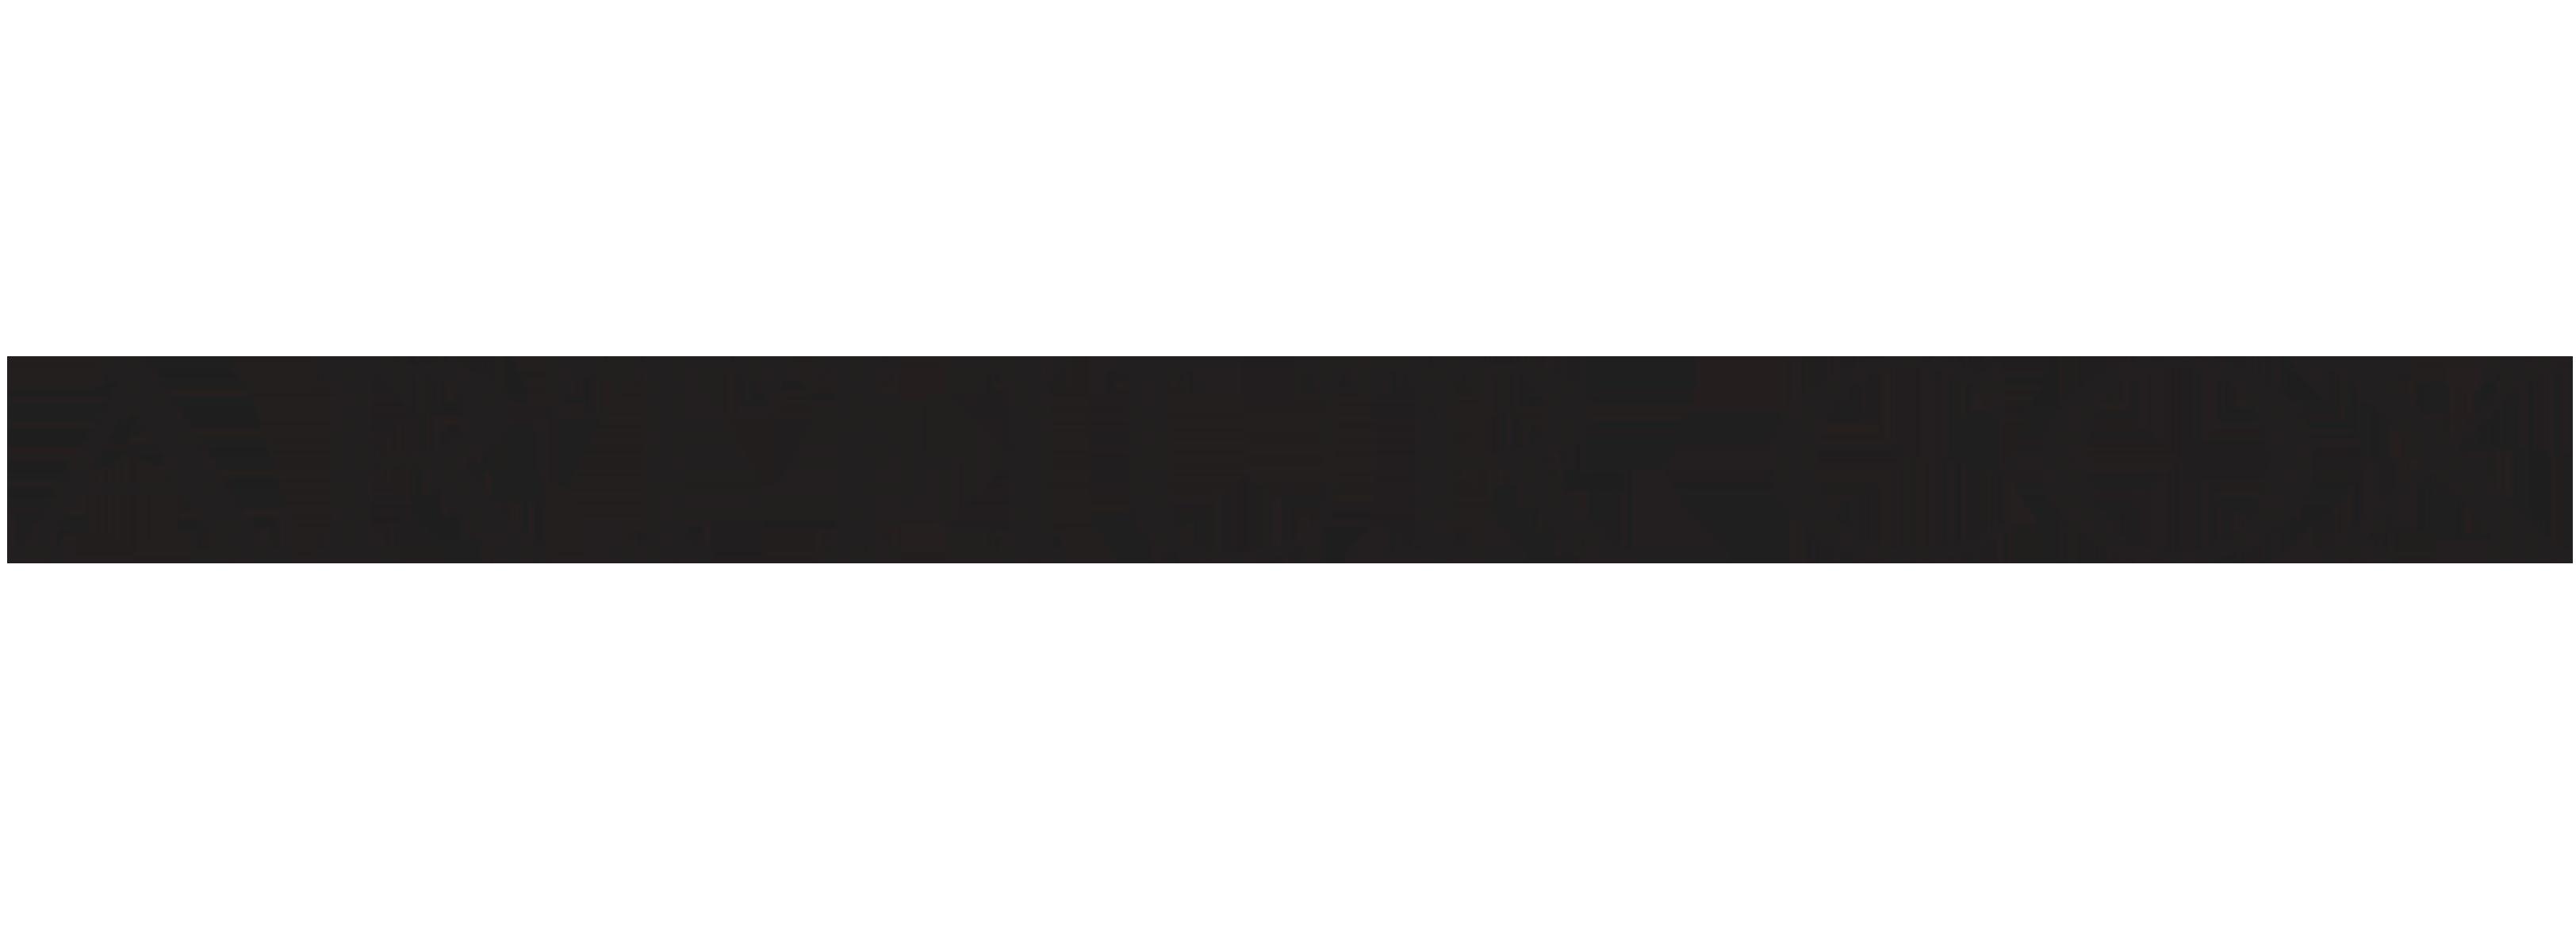 Arthur_cox